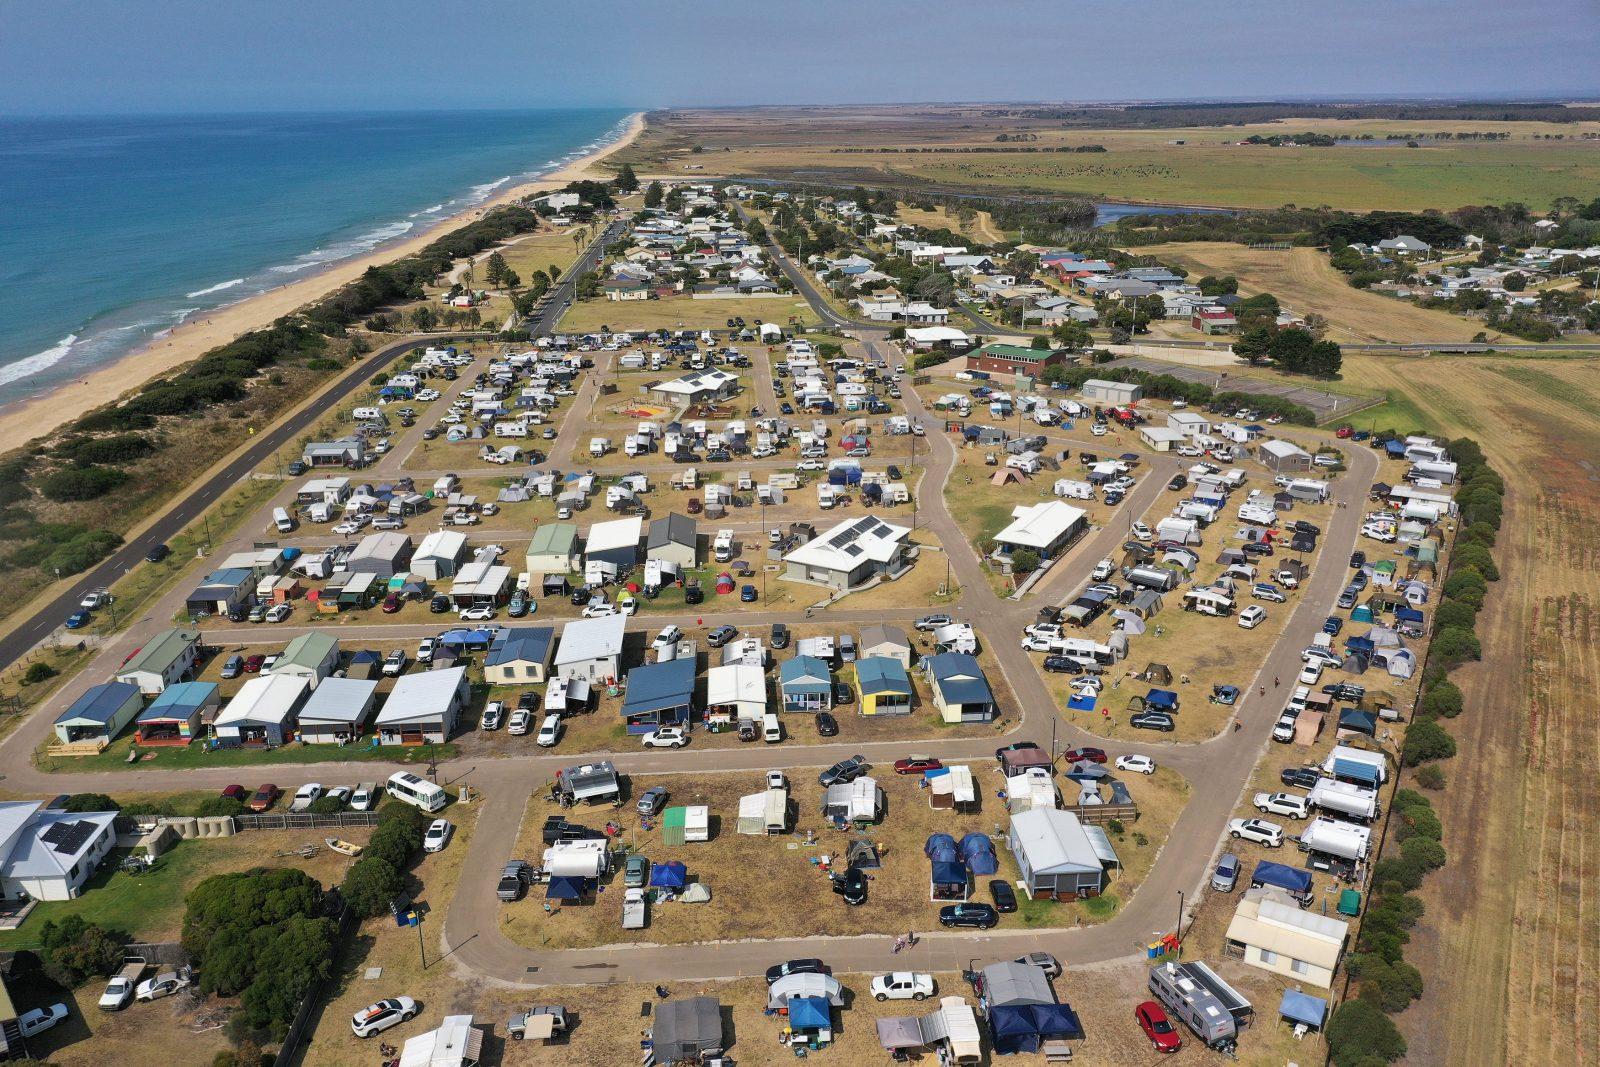 Aerial of Seaspray and caravan park